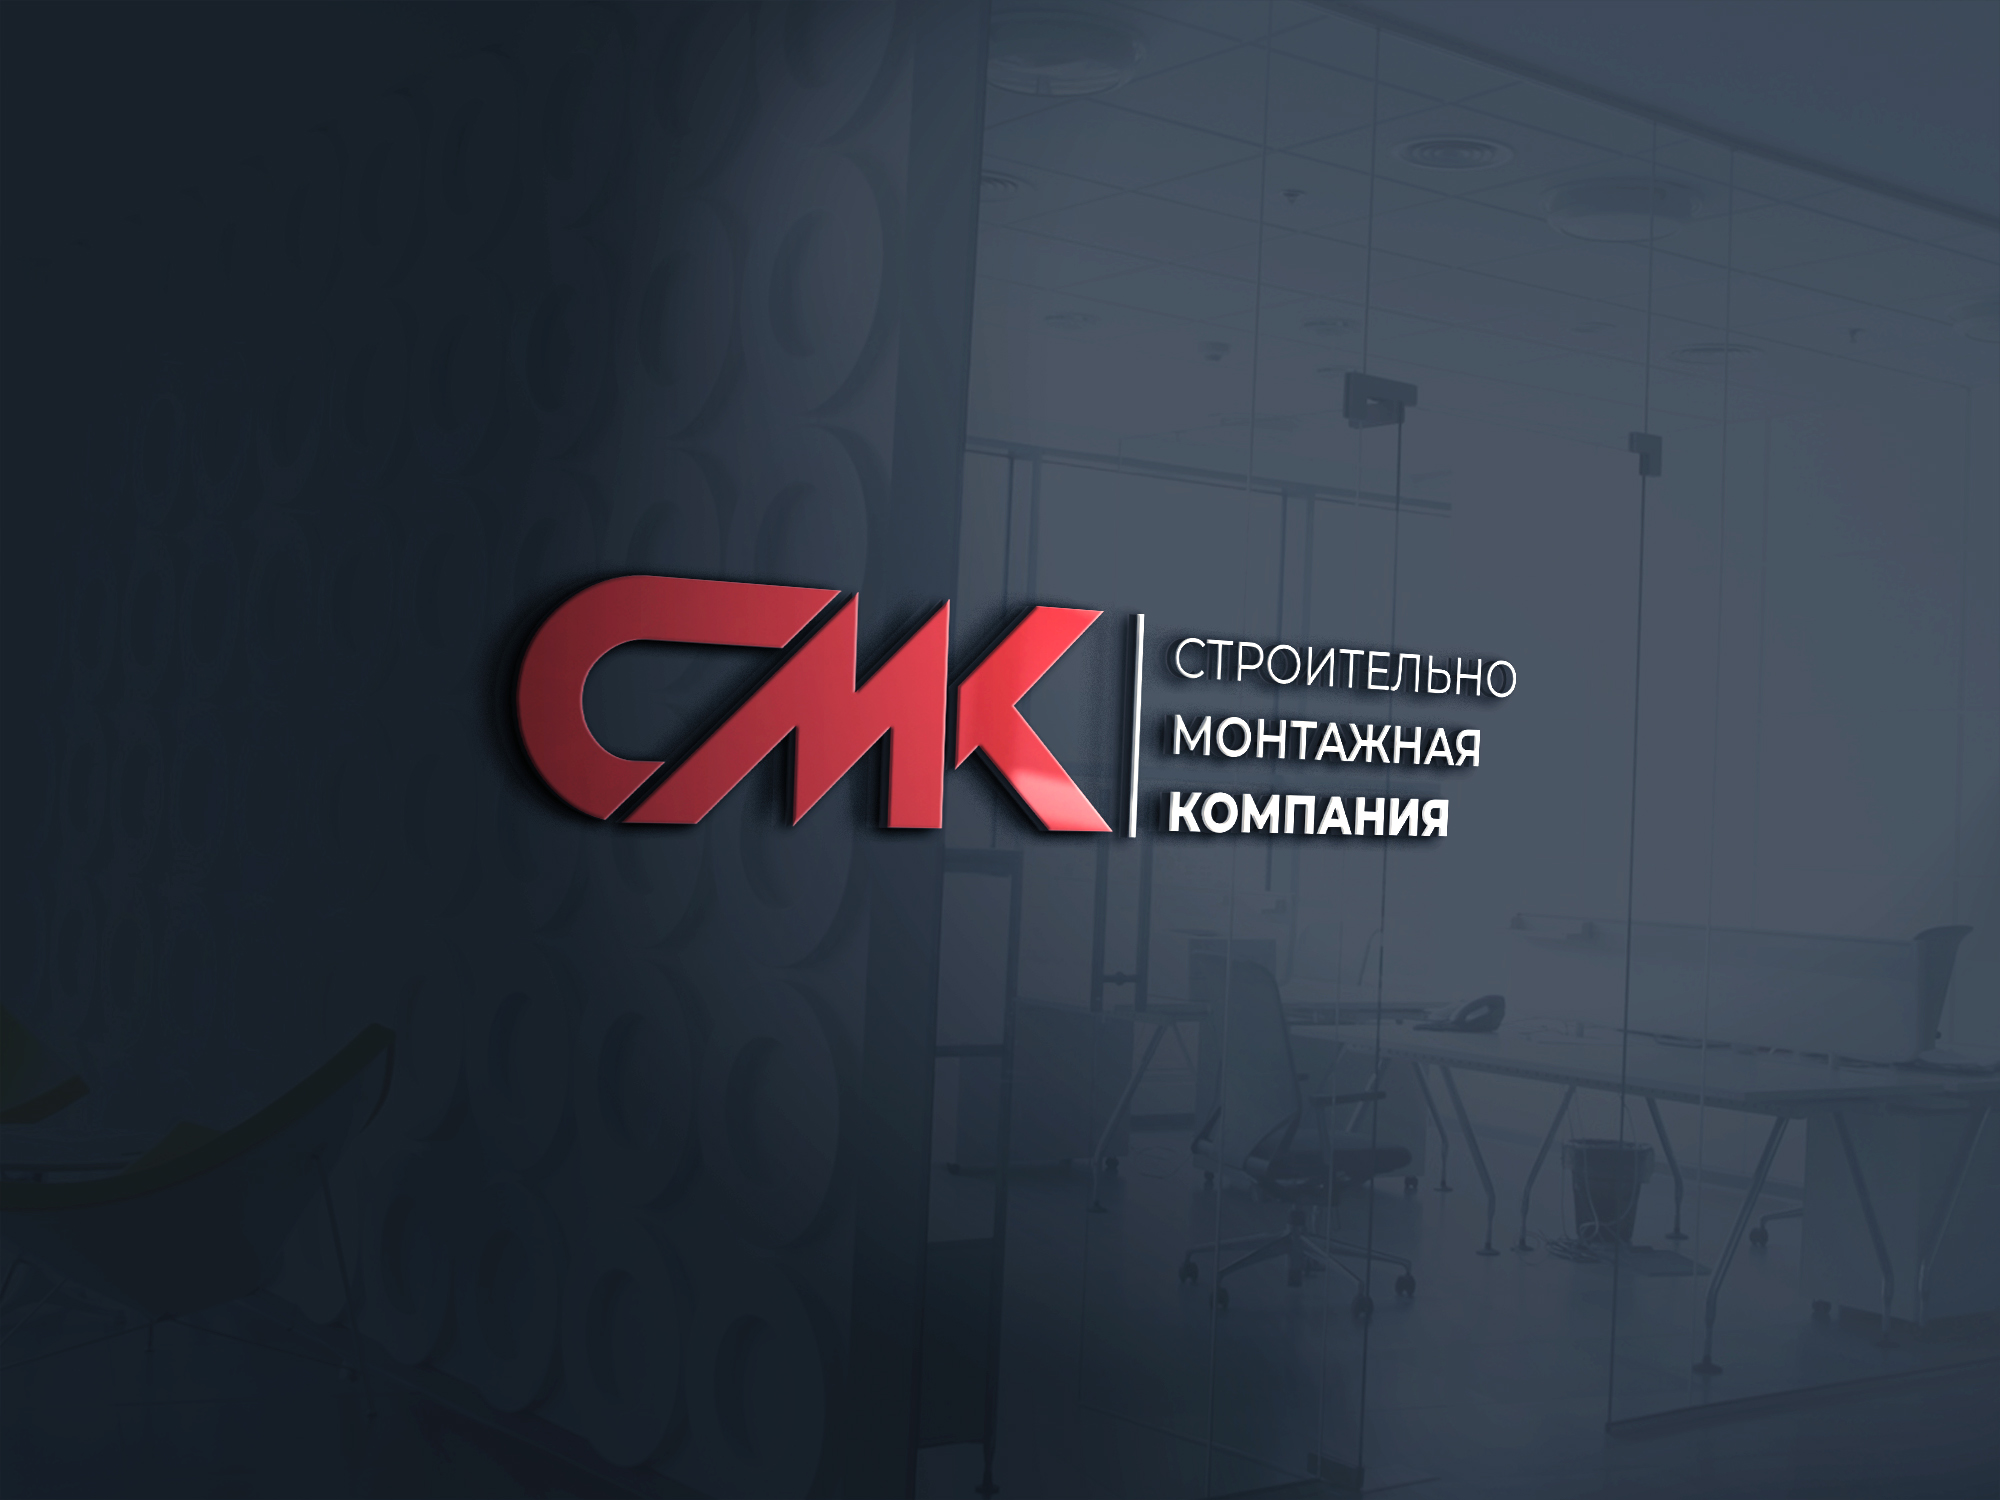 Разработка логотипа компании фото f_2425de119204ae10.jpg